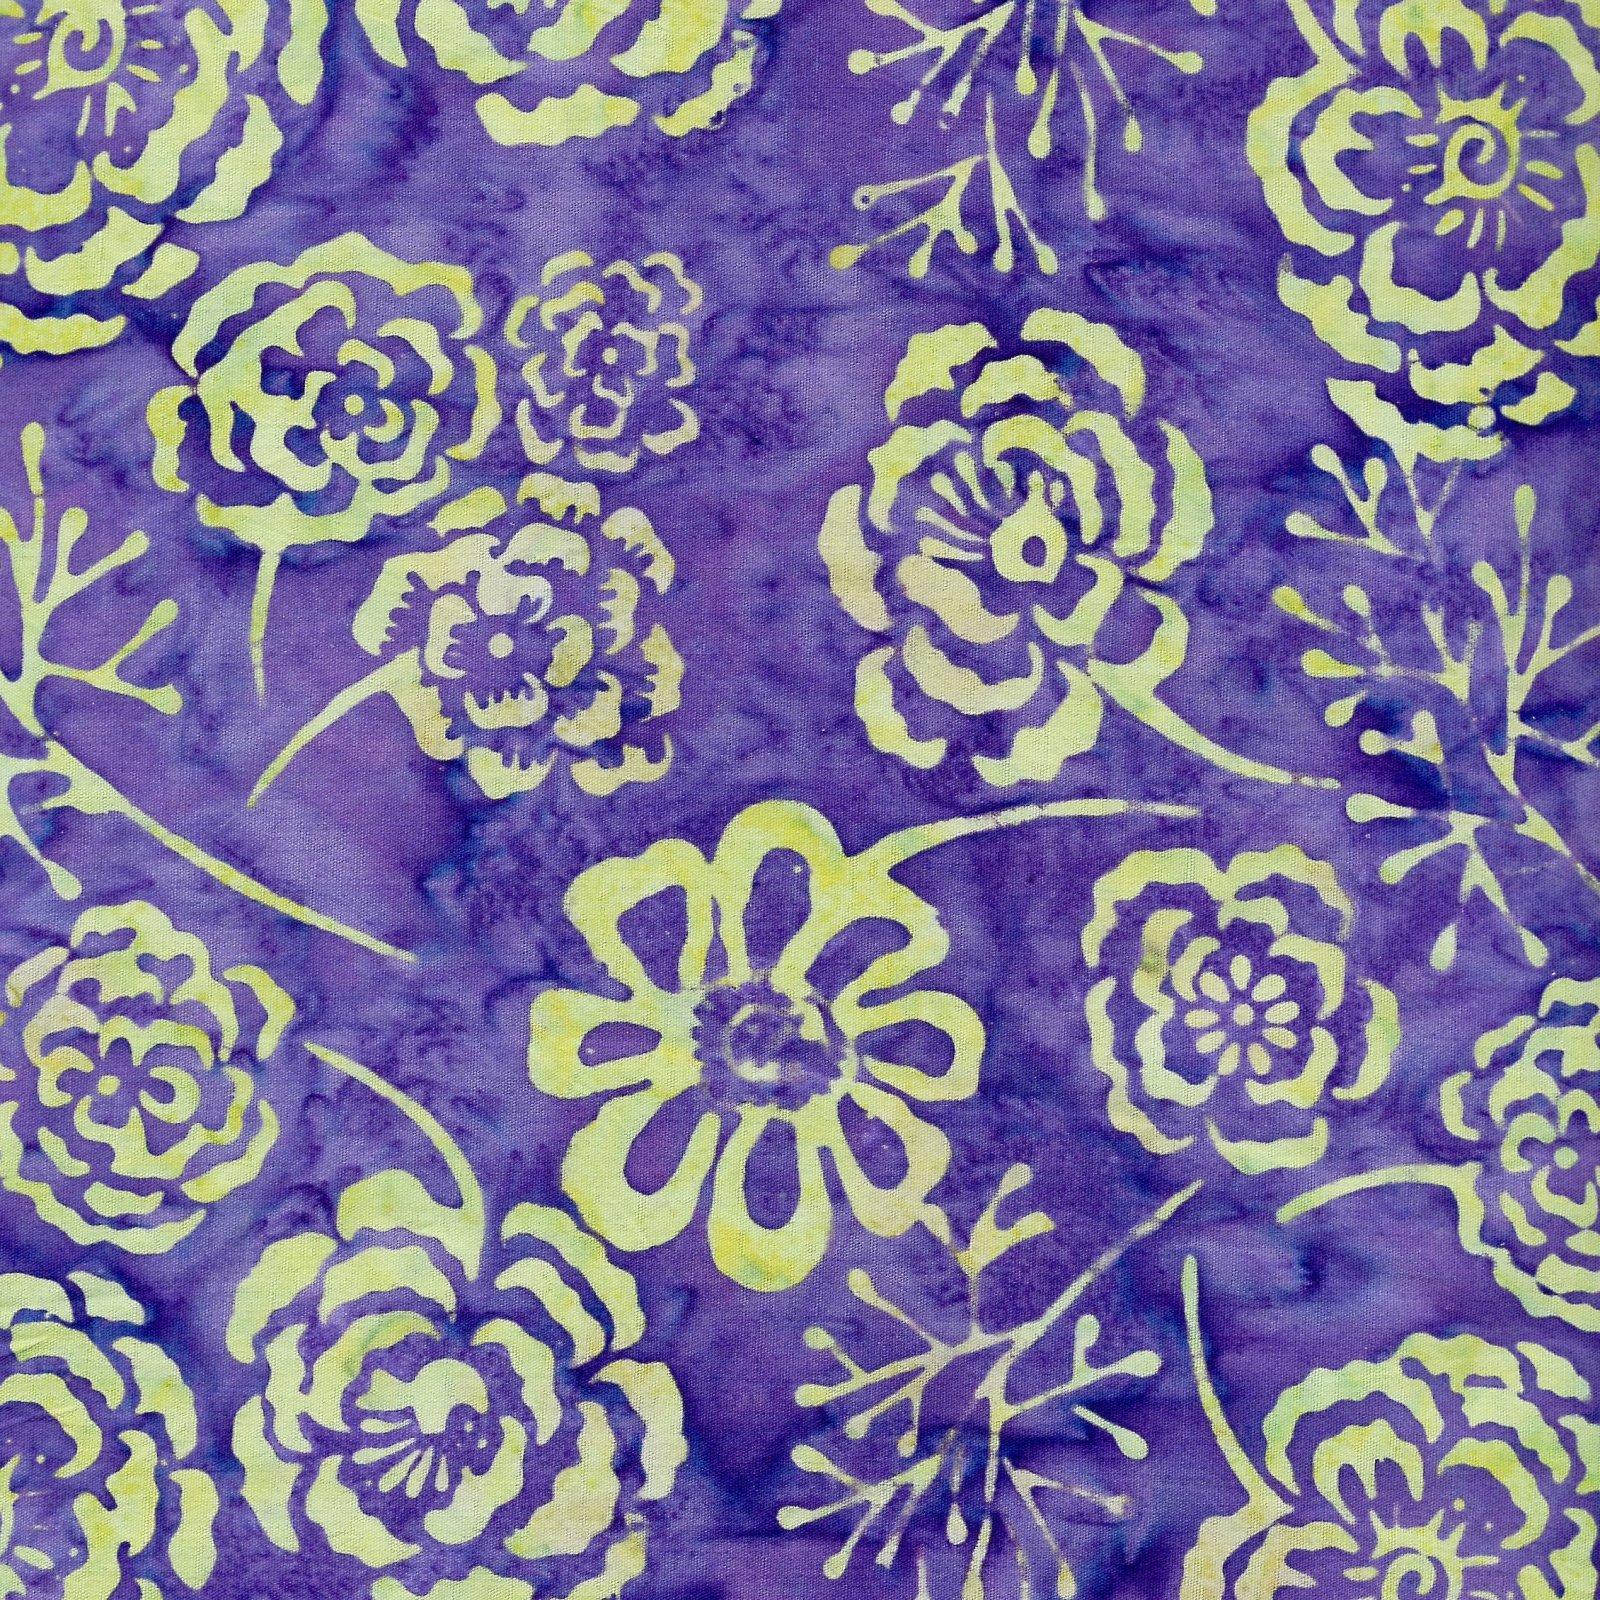 Batik by Mirah Sunset Bloom Flowers - Purple/Green (Min order 1m)